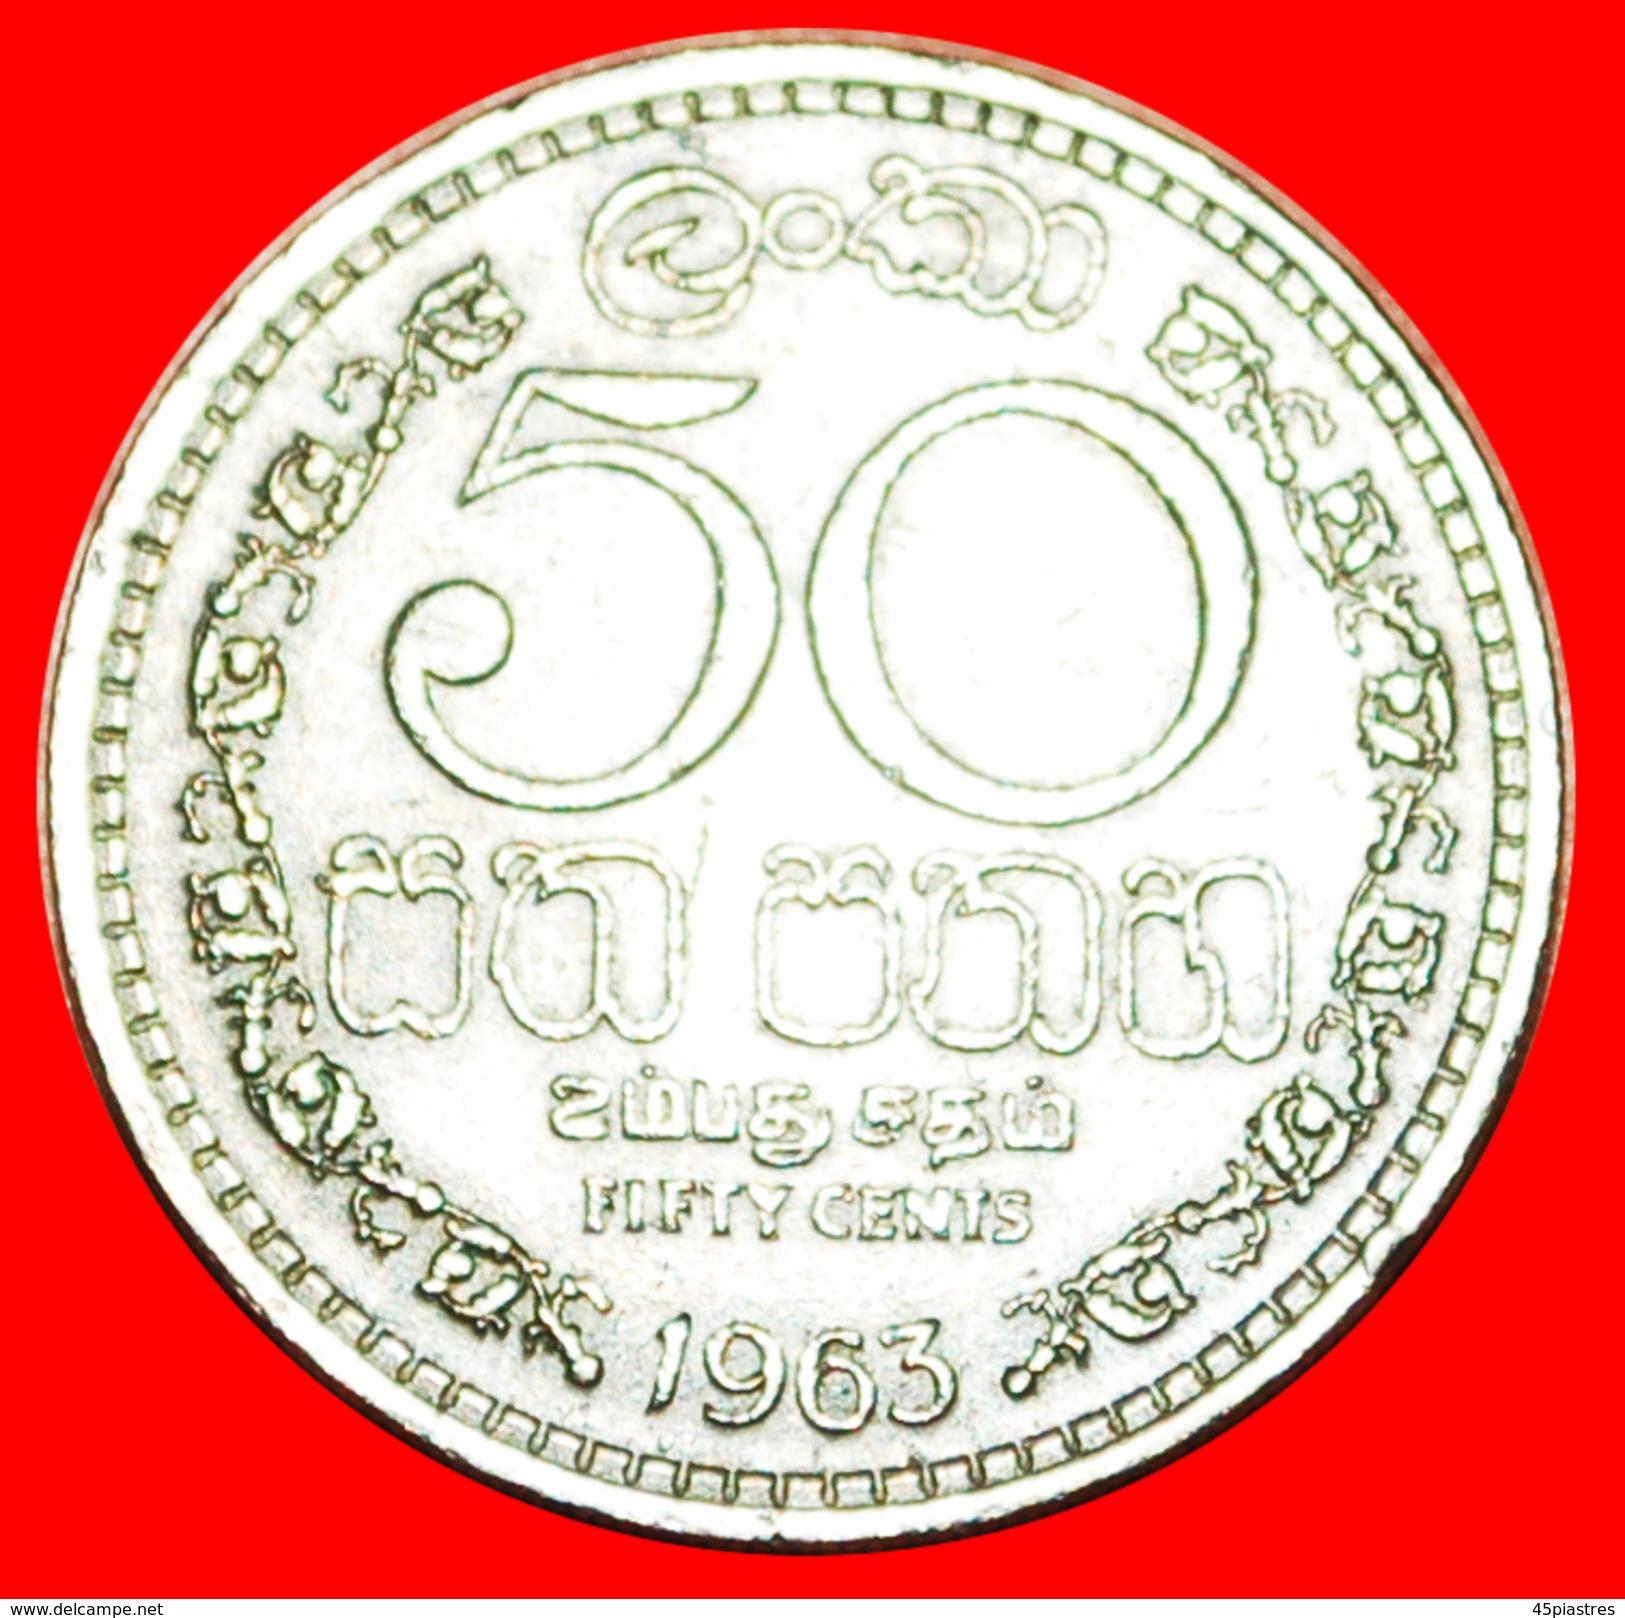 § BRITISH COMMONWEALTH: CEYLON ★ 50 CENTS 1963! LOW START★ NO RESERVE! - Sri Lanka